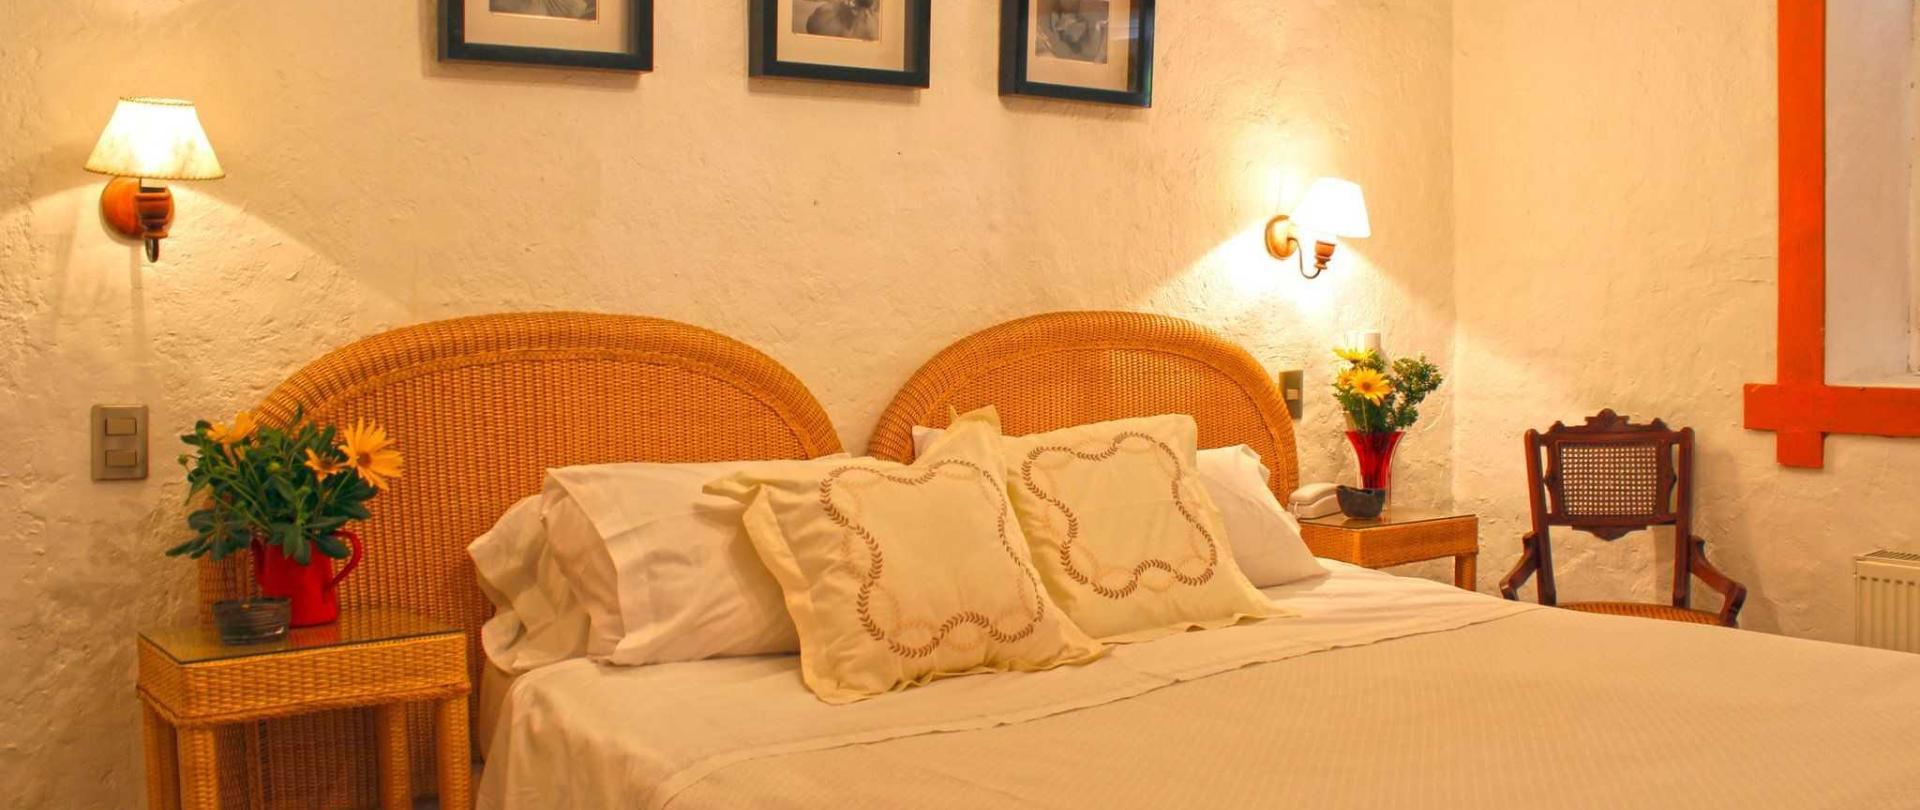 hotel-vendimia-parador-santa-cruz-valle-de-colchagua-20.jpg